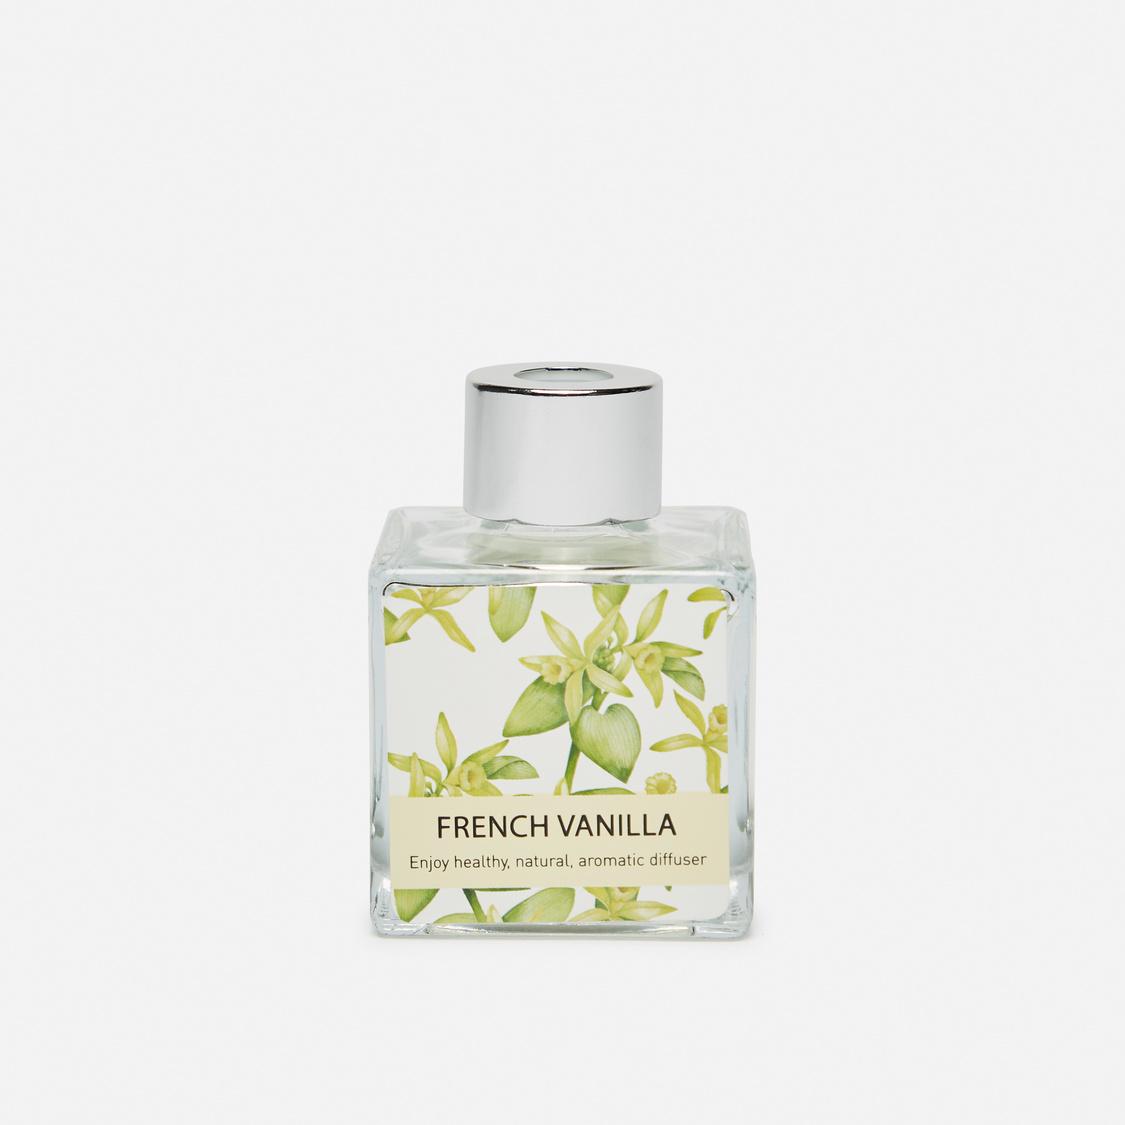 French Vanilla Reed Diffuser - 50 ml